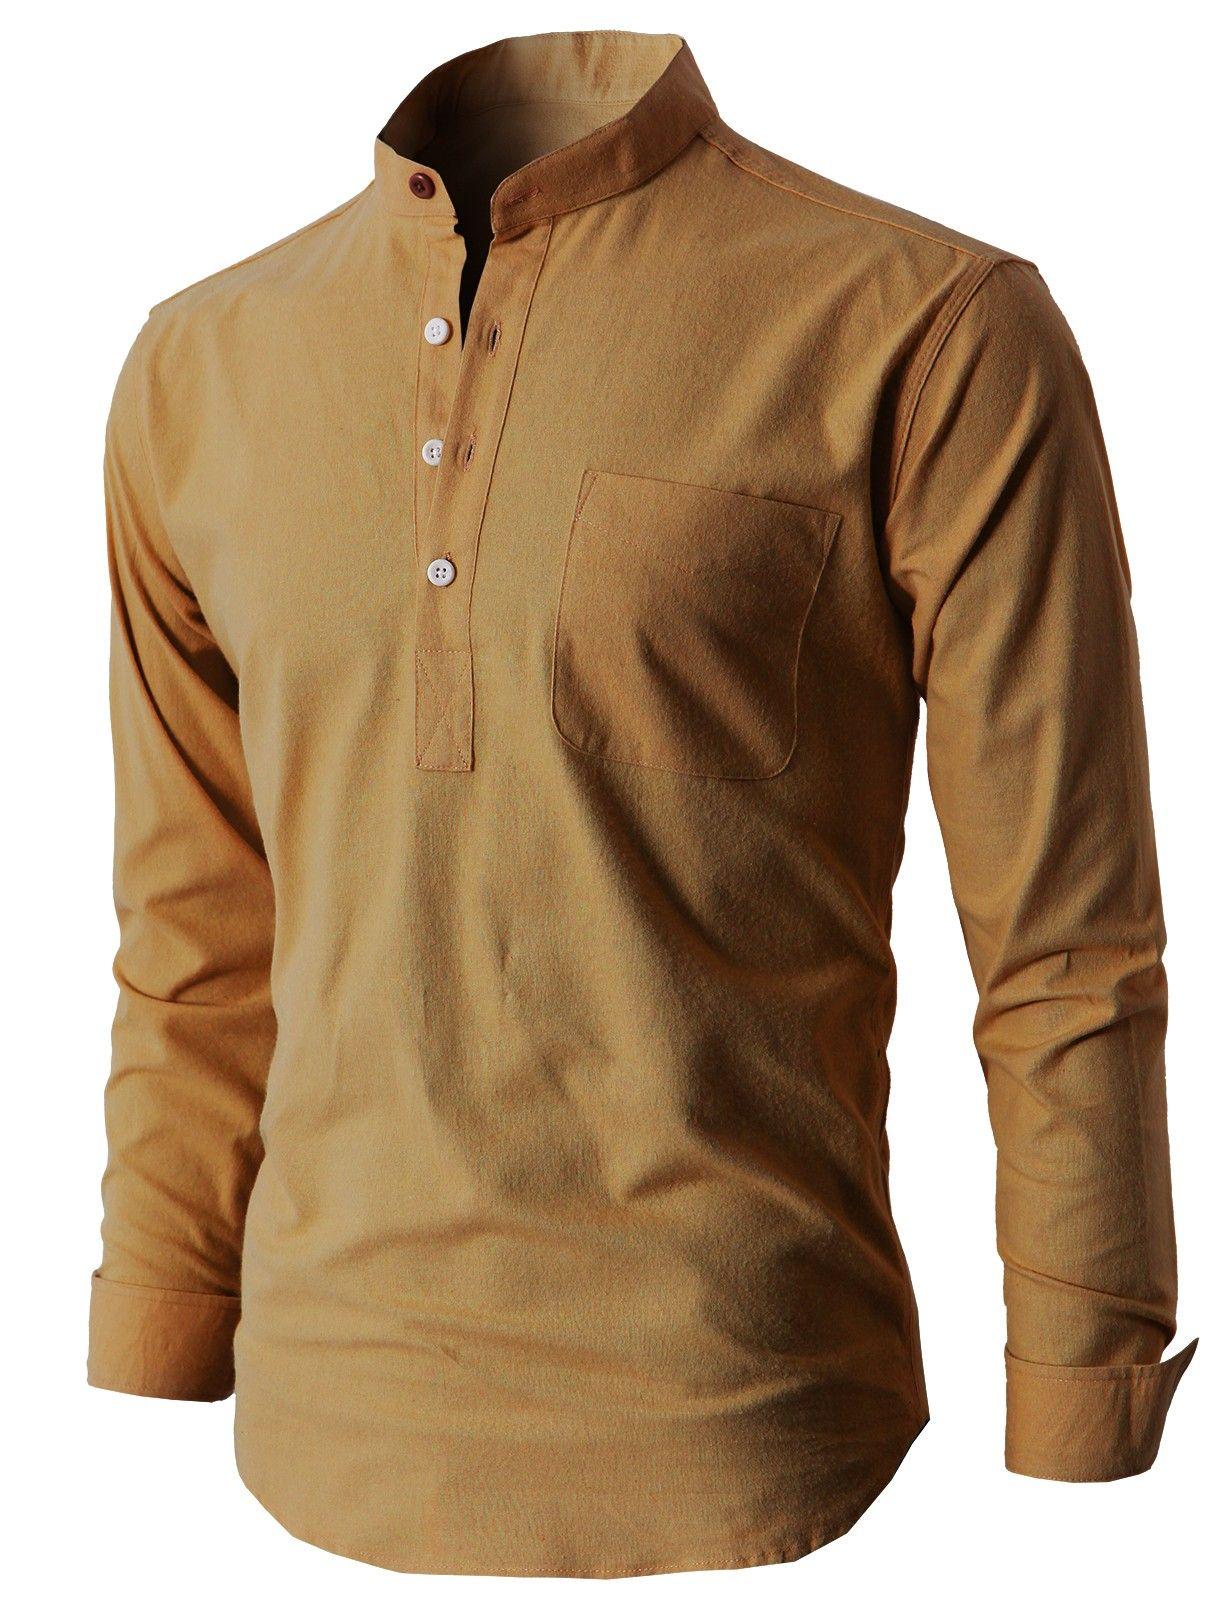 Men's Clothing Fine Vintage Dress Mens Shirt Cotton Medieval Renaissance Viking Tunic Long Sleeve Shirts Male Tops Camisas Kurta Men Clothes